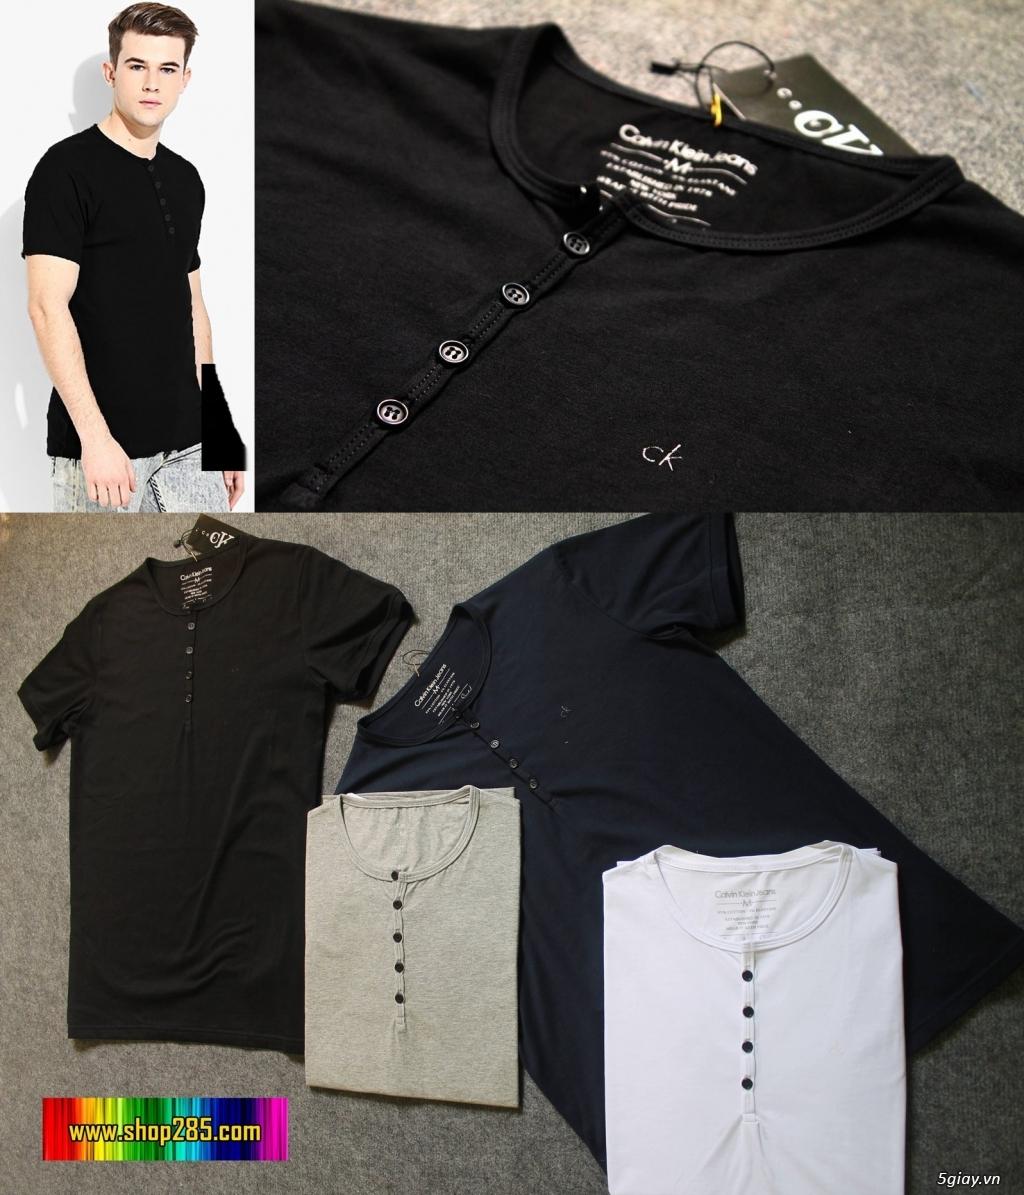 Áo thun Hollister VNXK,áo thun SuperDry VNXK ,áo A&F VNXK ,áo thun cổ tim thun láng - 37